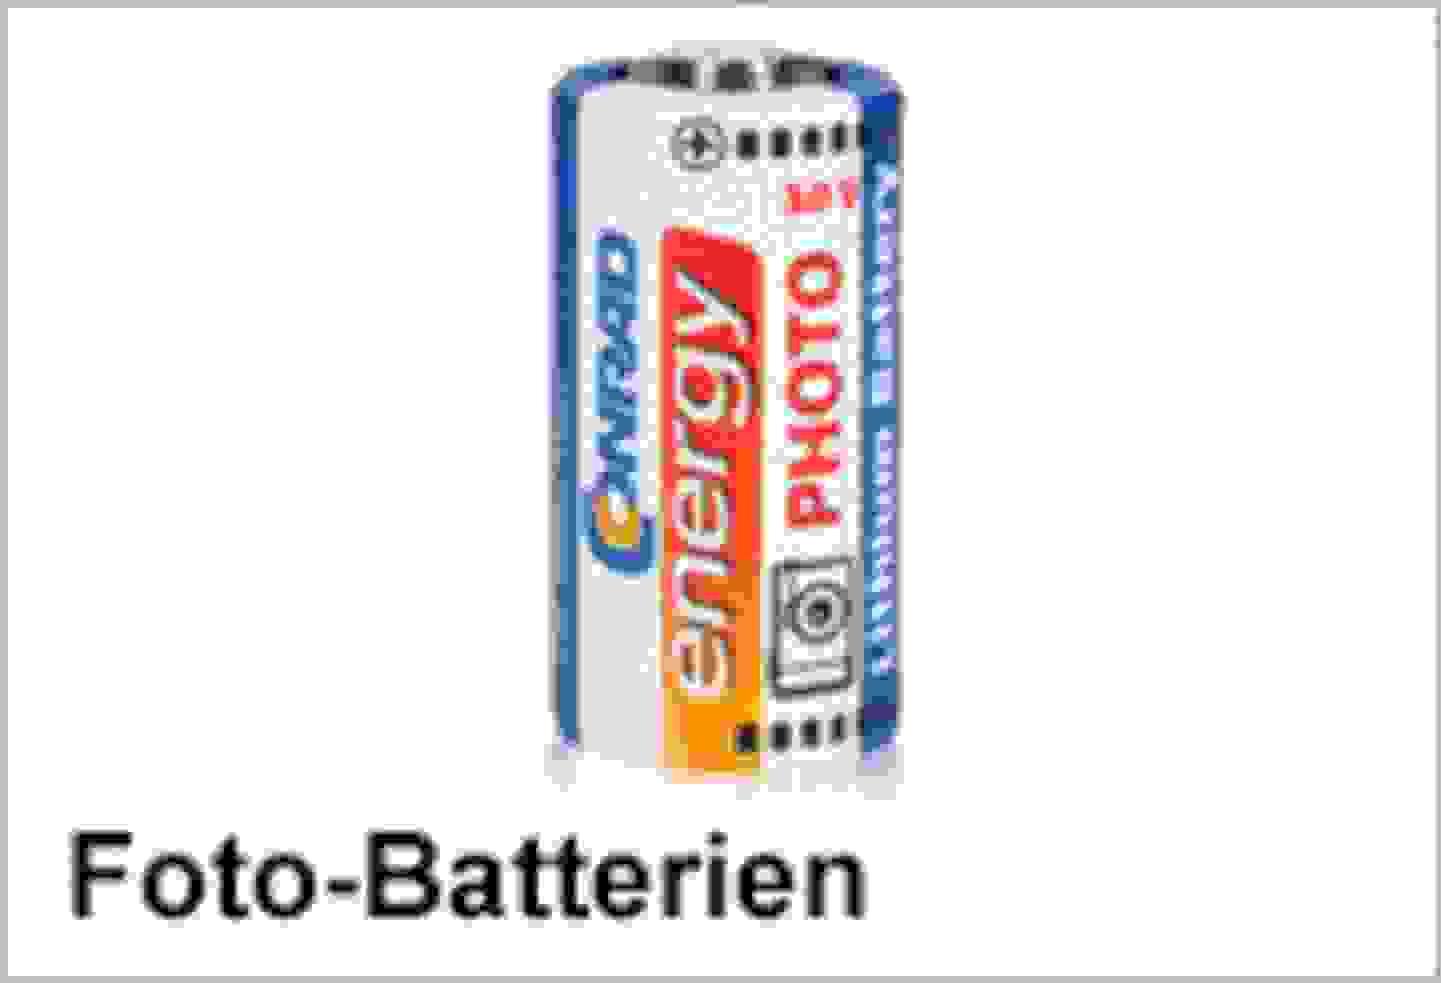 Conrad Energy Foto-Batterien